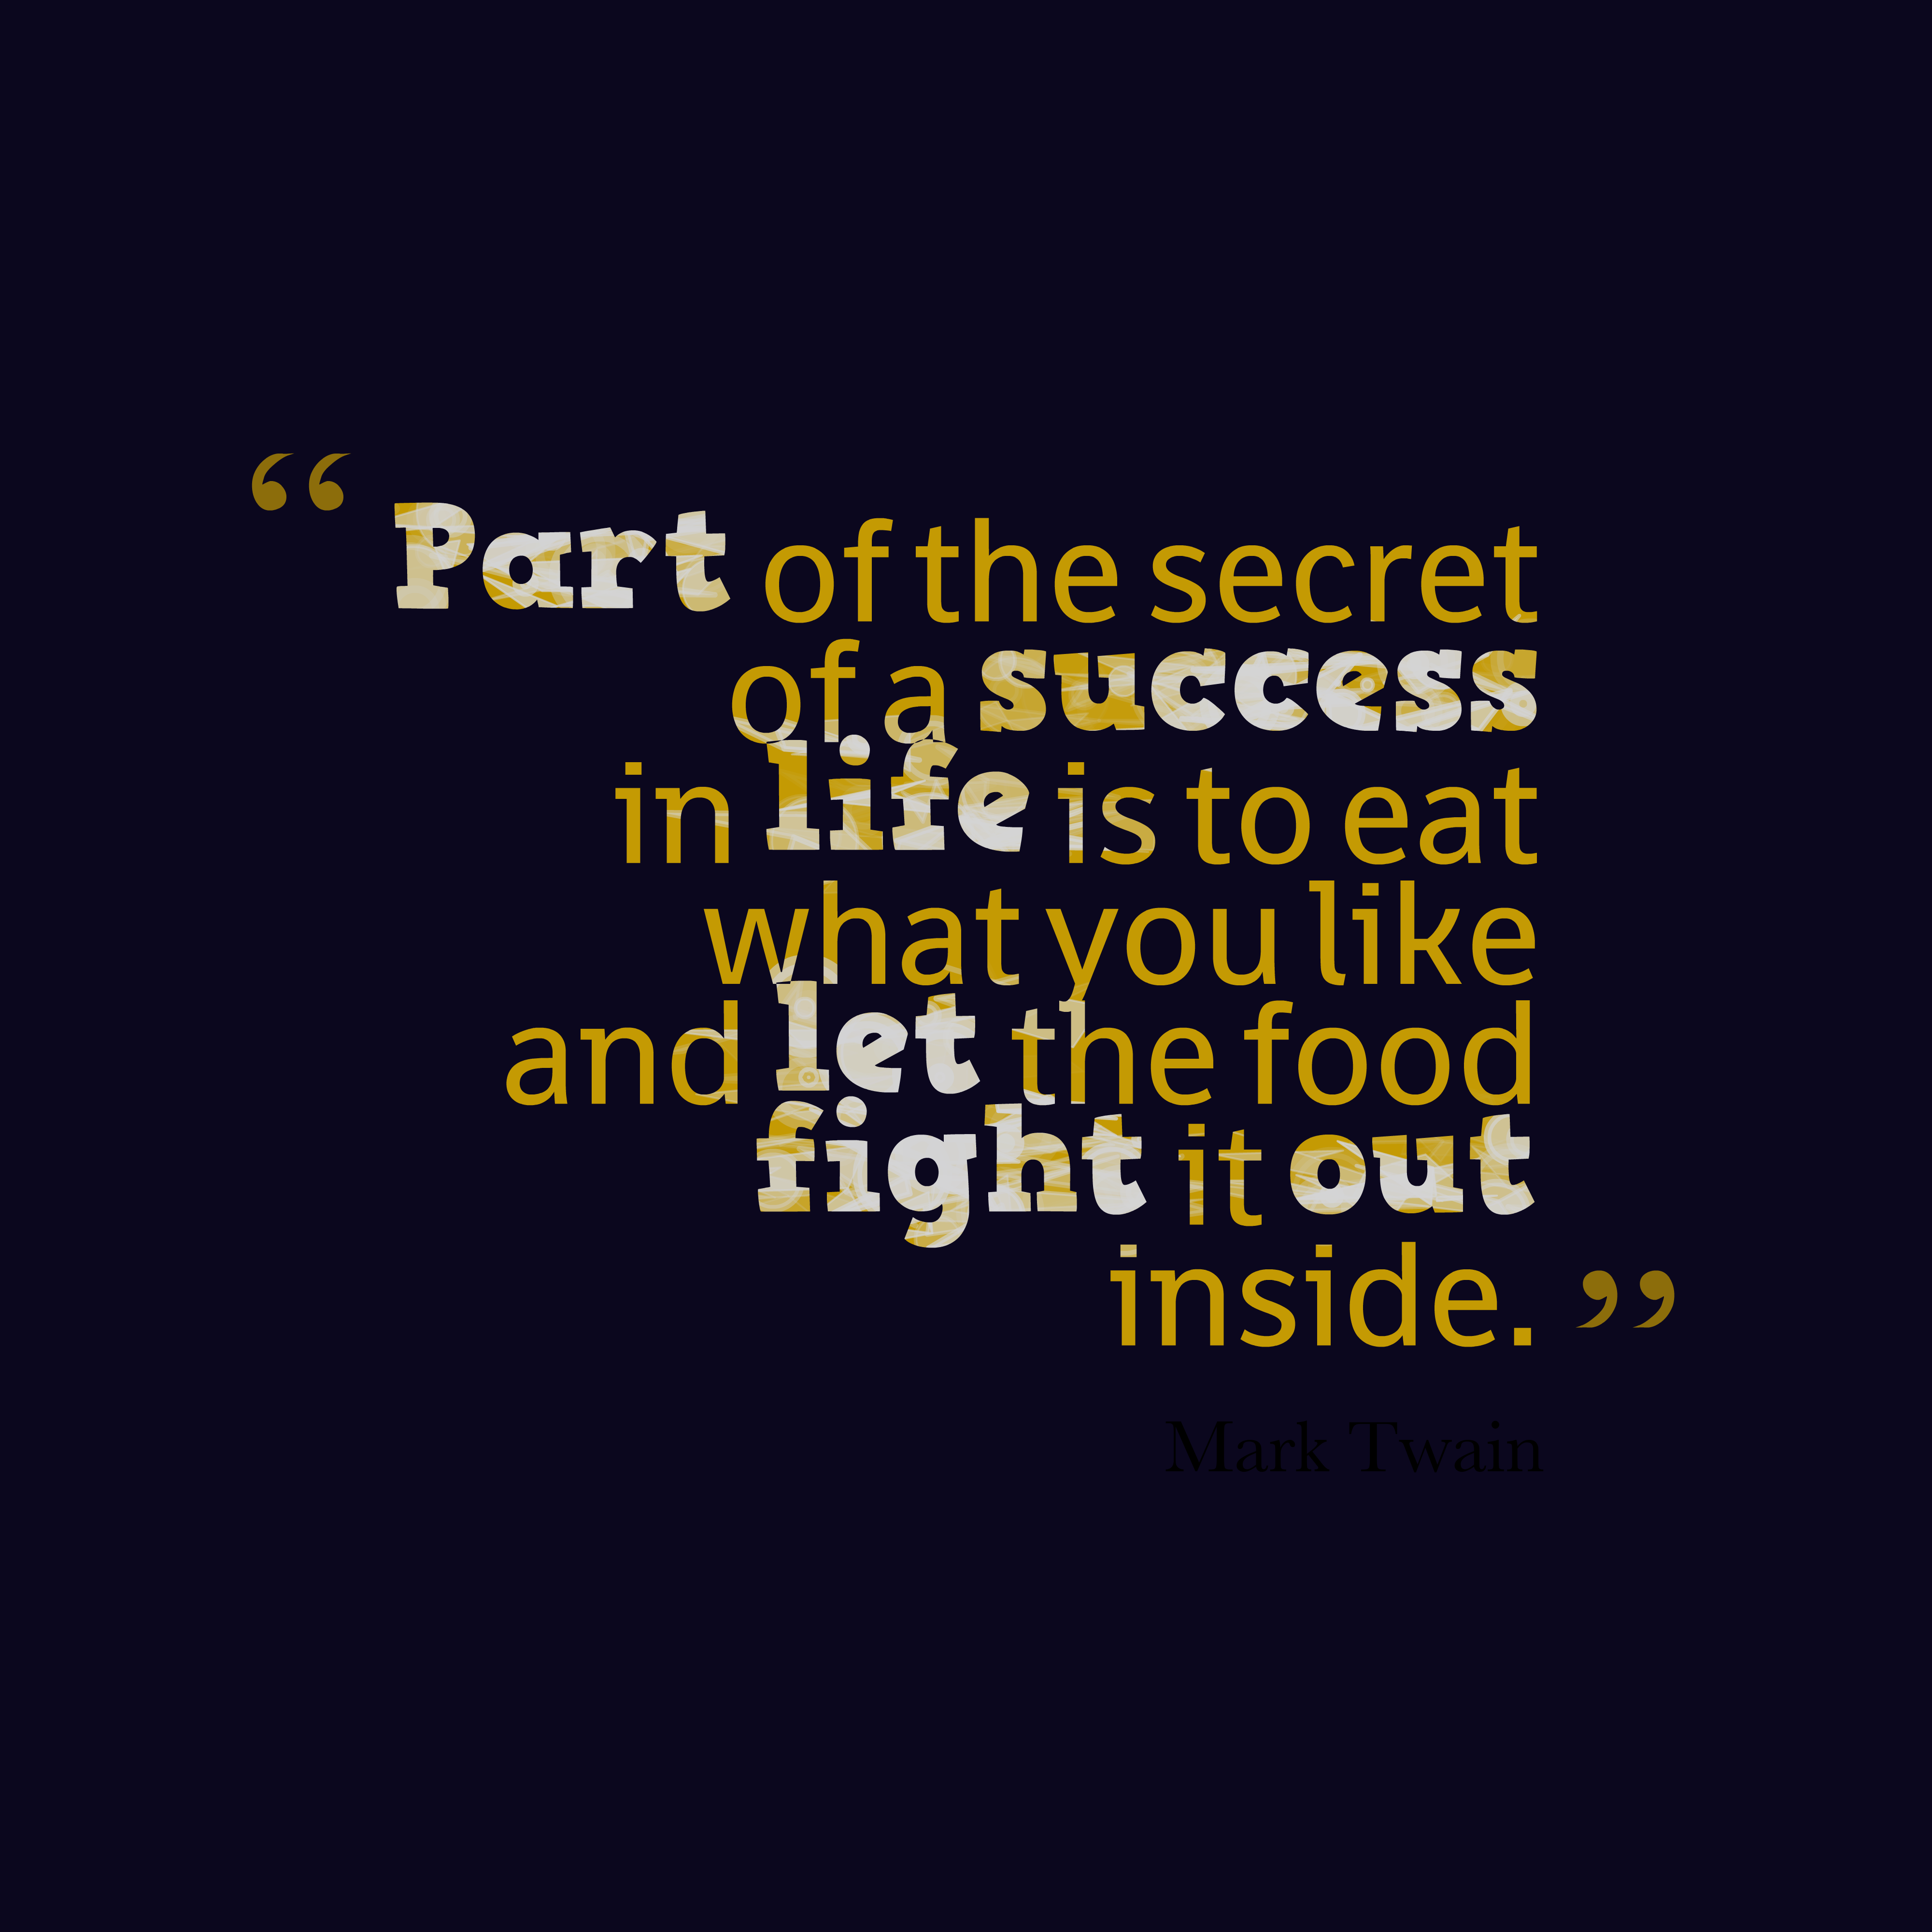 mark twain quotes pdf